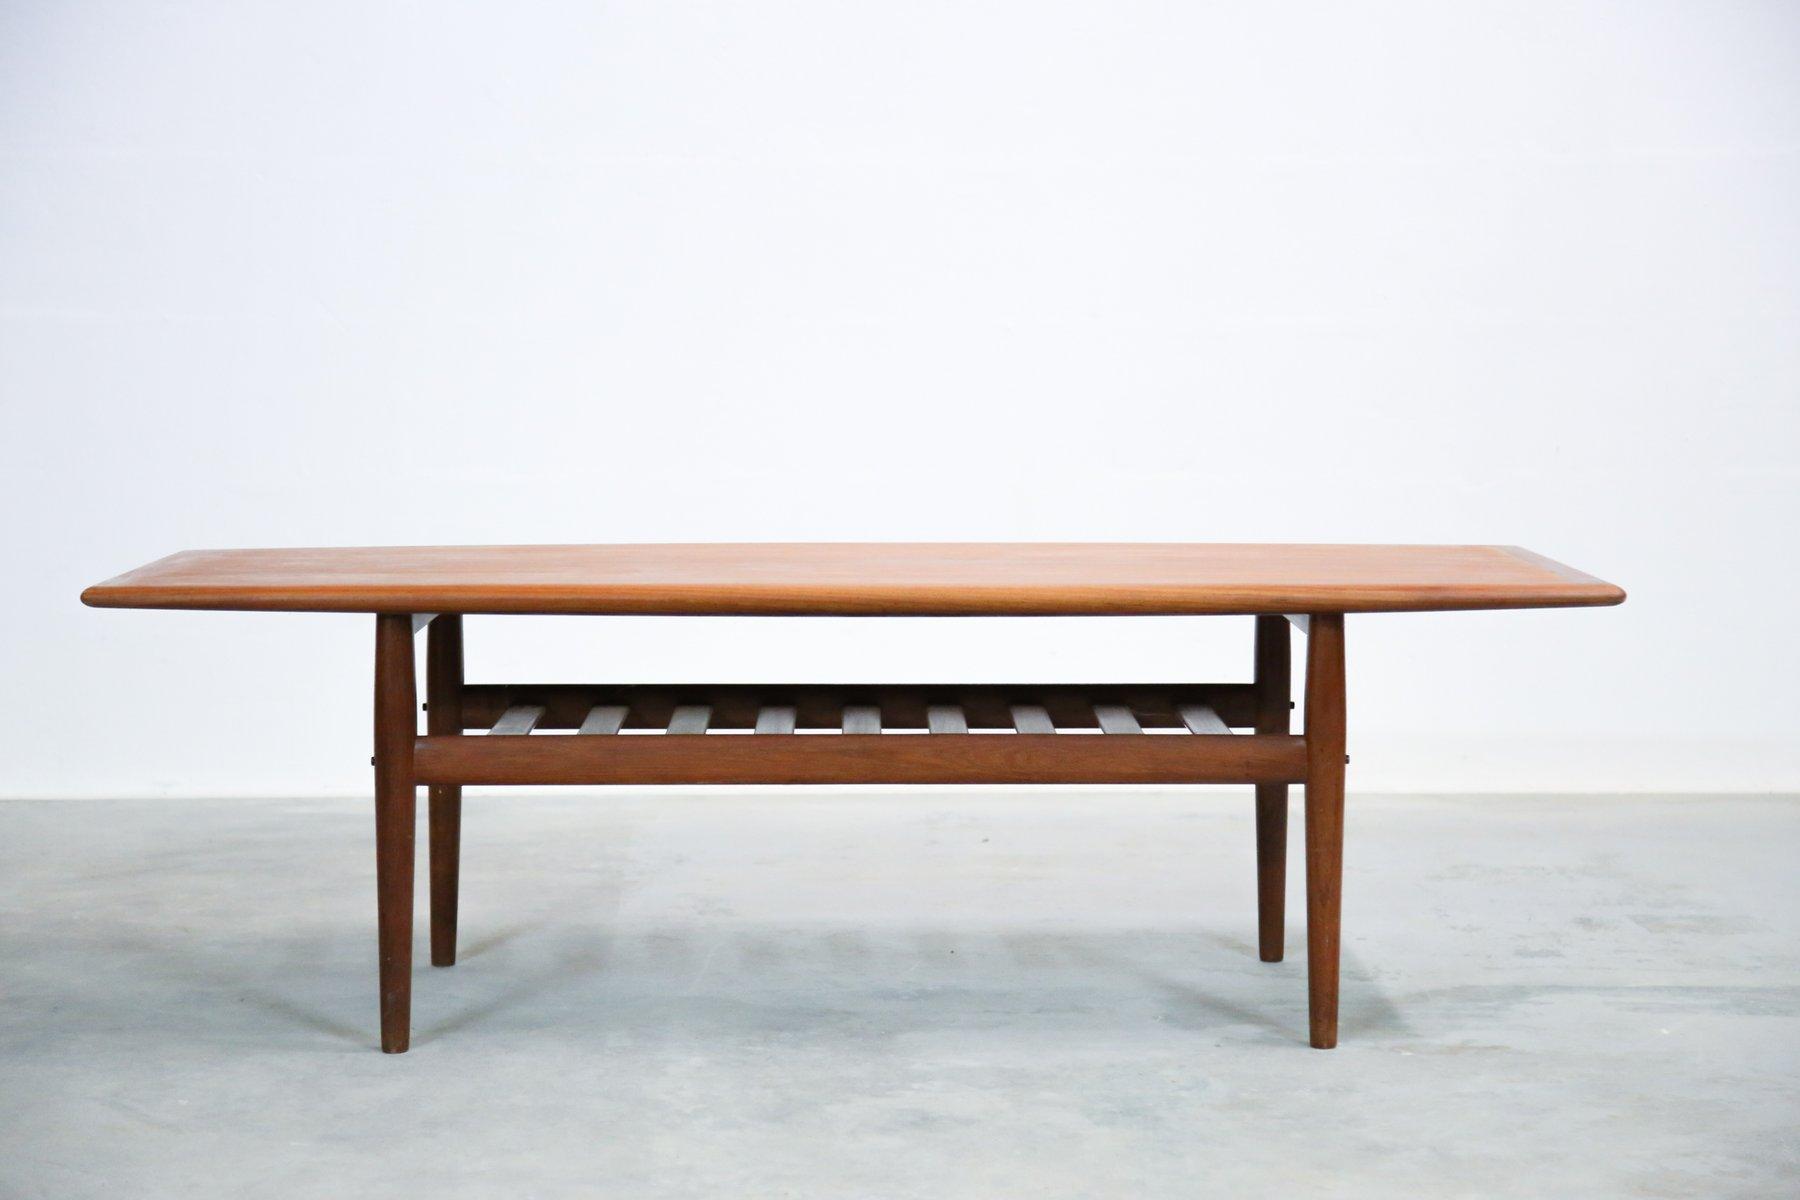 teak coffee table. Danish Teak Coffee Table By Grete Jalk For Glostrup